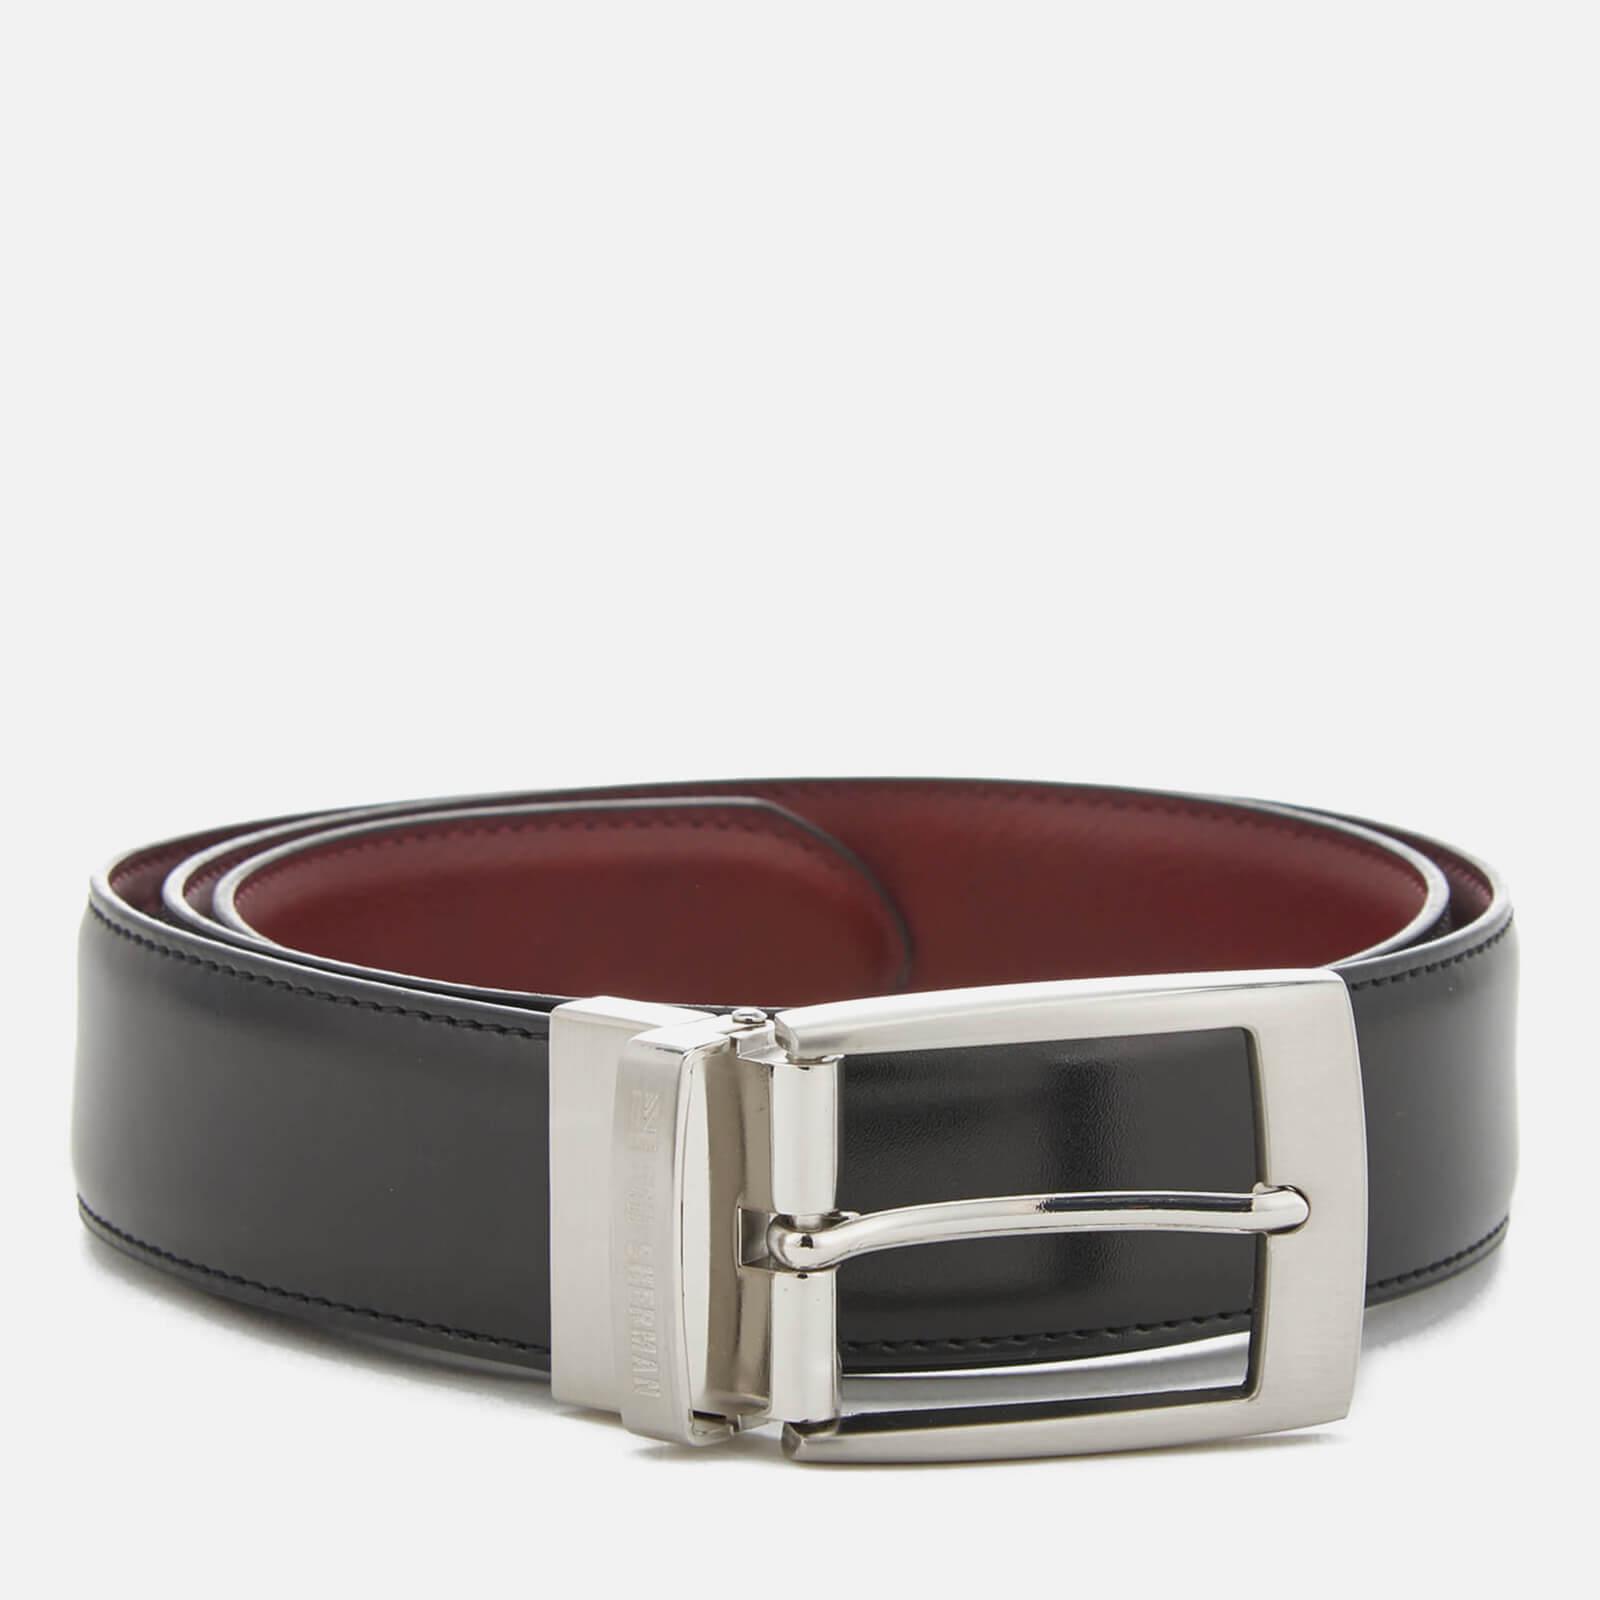 5477946cc58c Ben Sherman Men's Sloane Reversible Belt - Black/Oxblood. Description